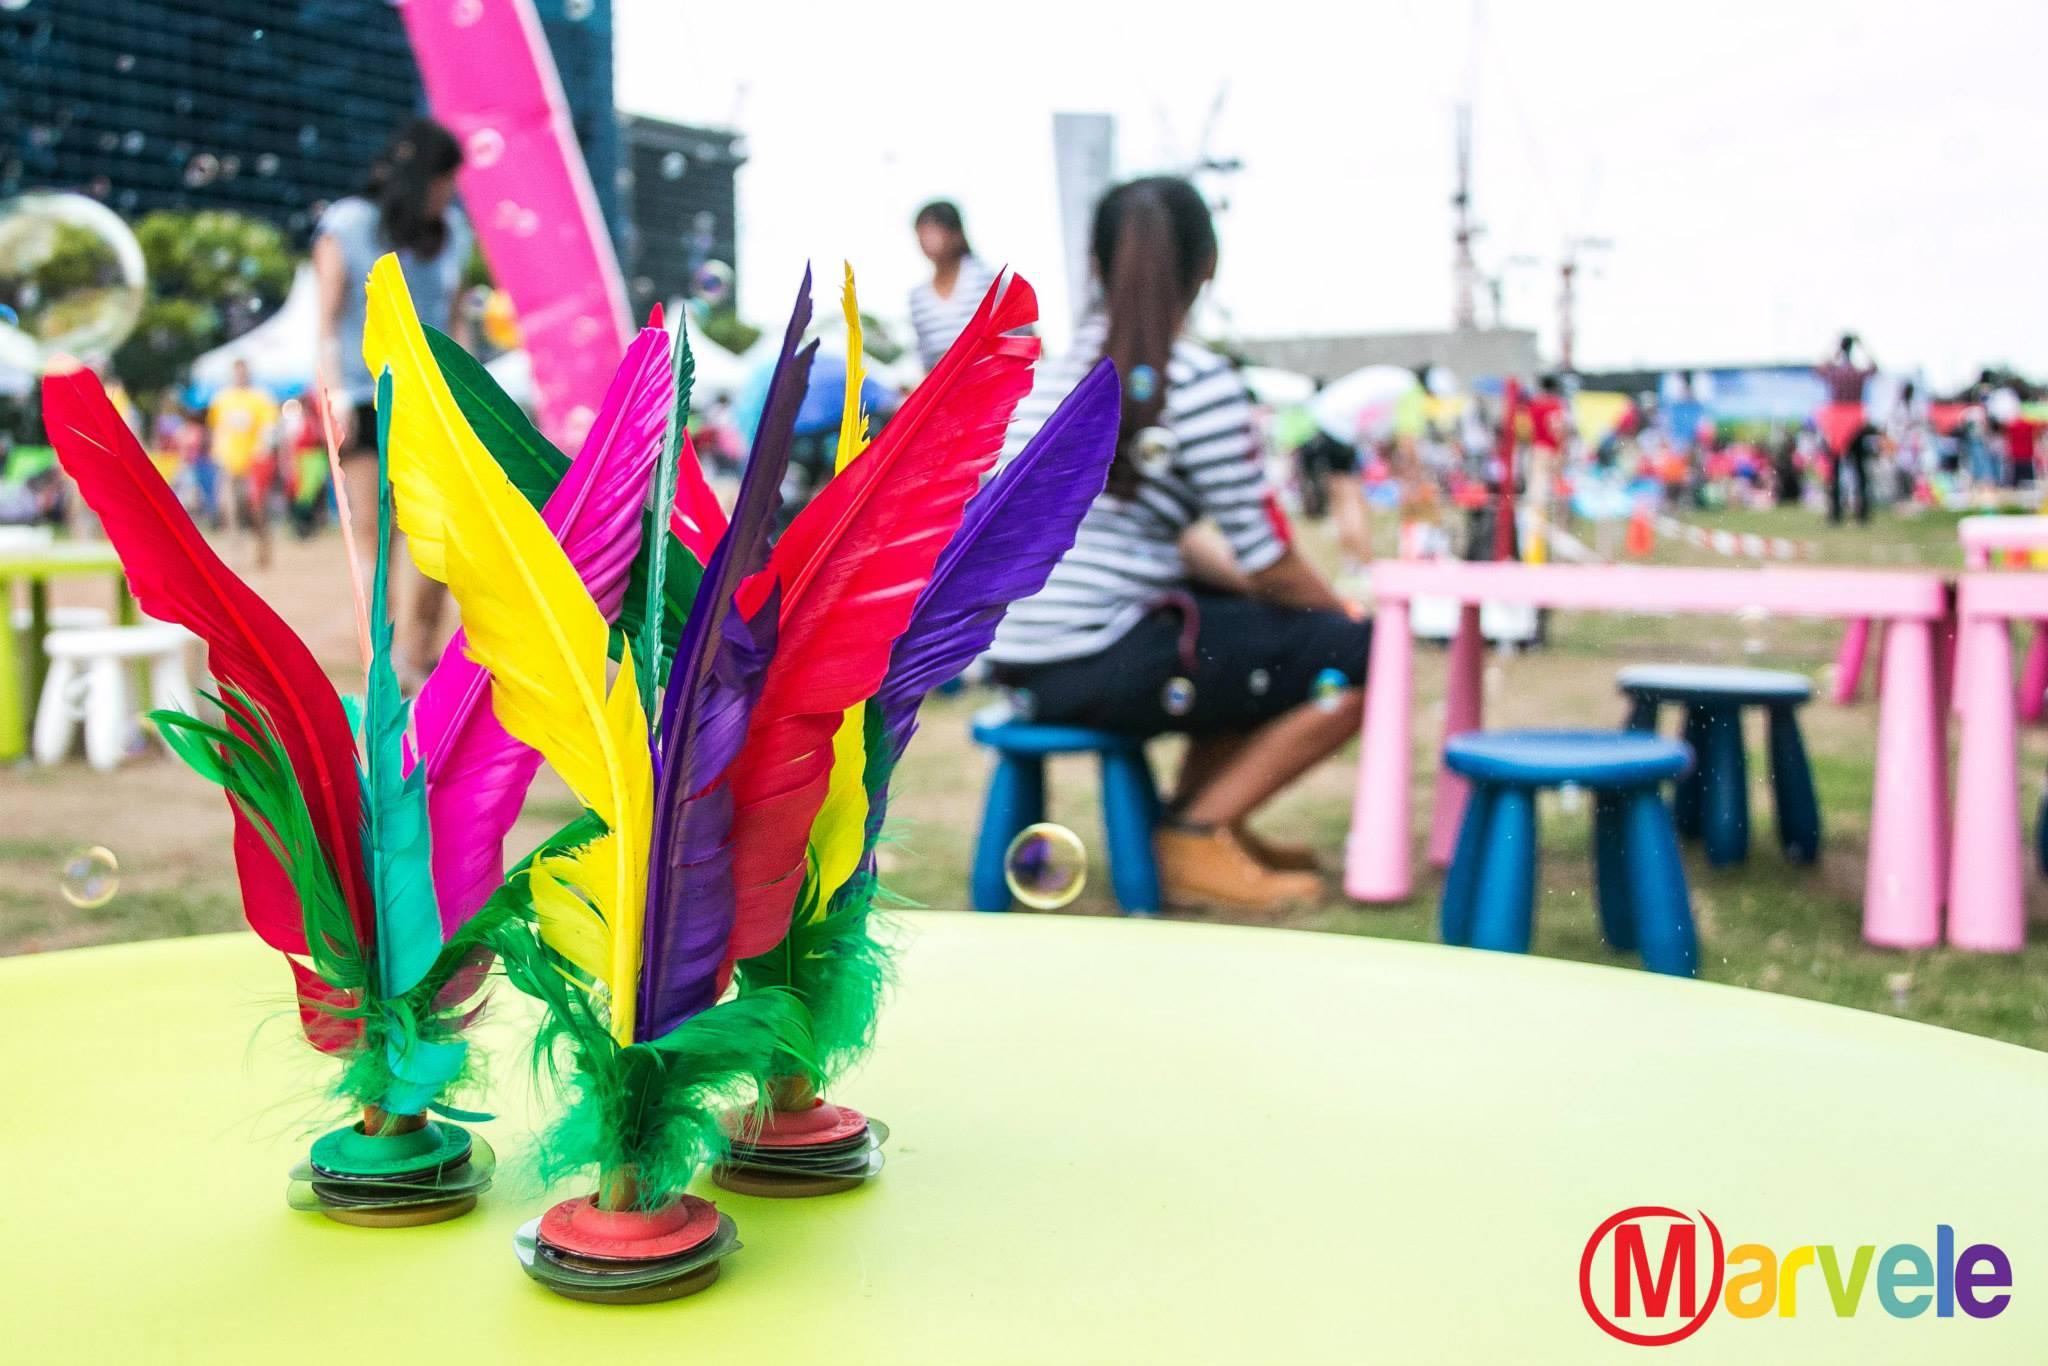 Event Management Company - Marvele